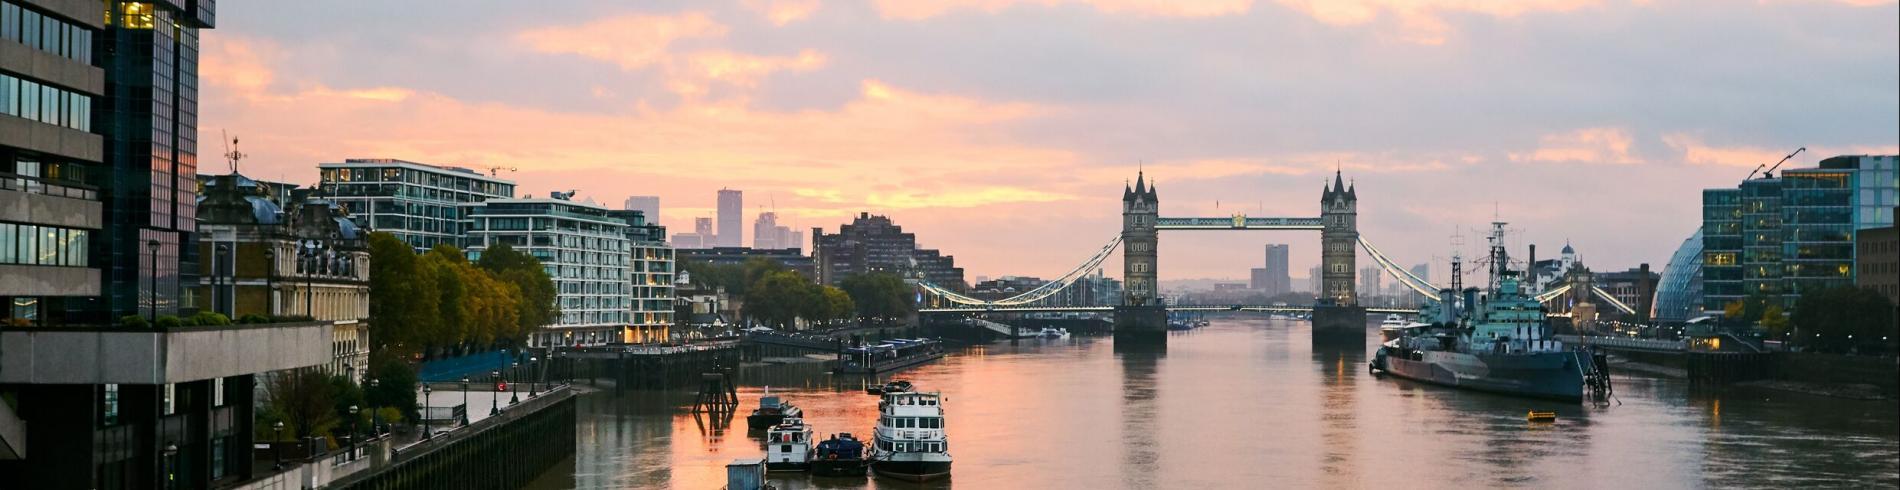 Tower Bridge au petit matin